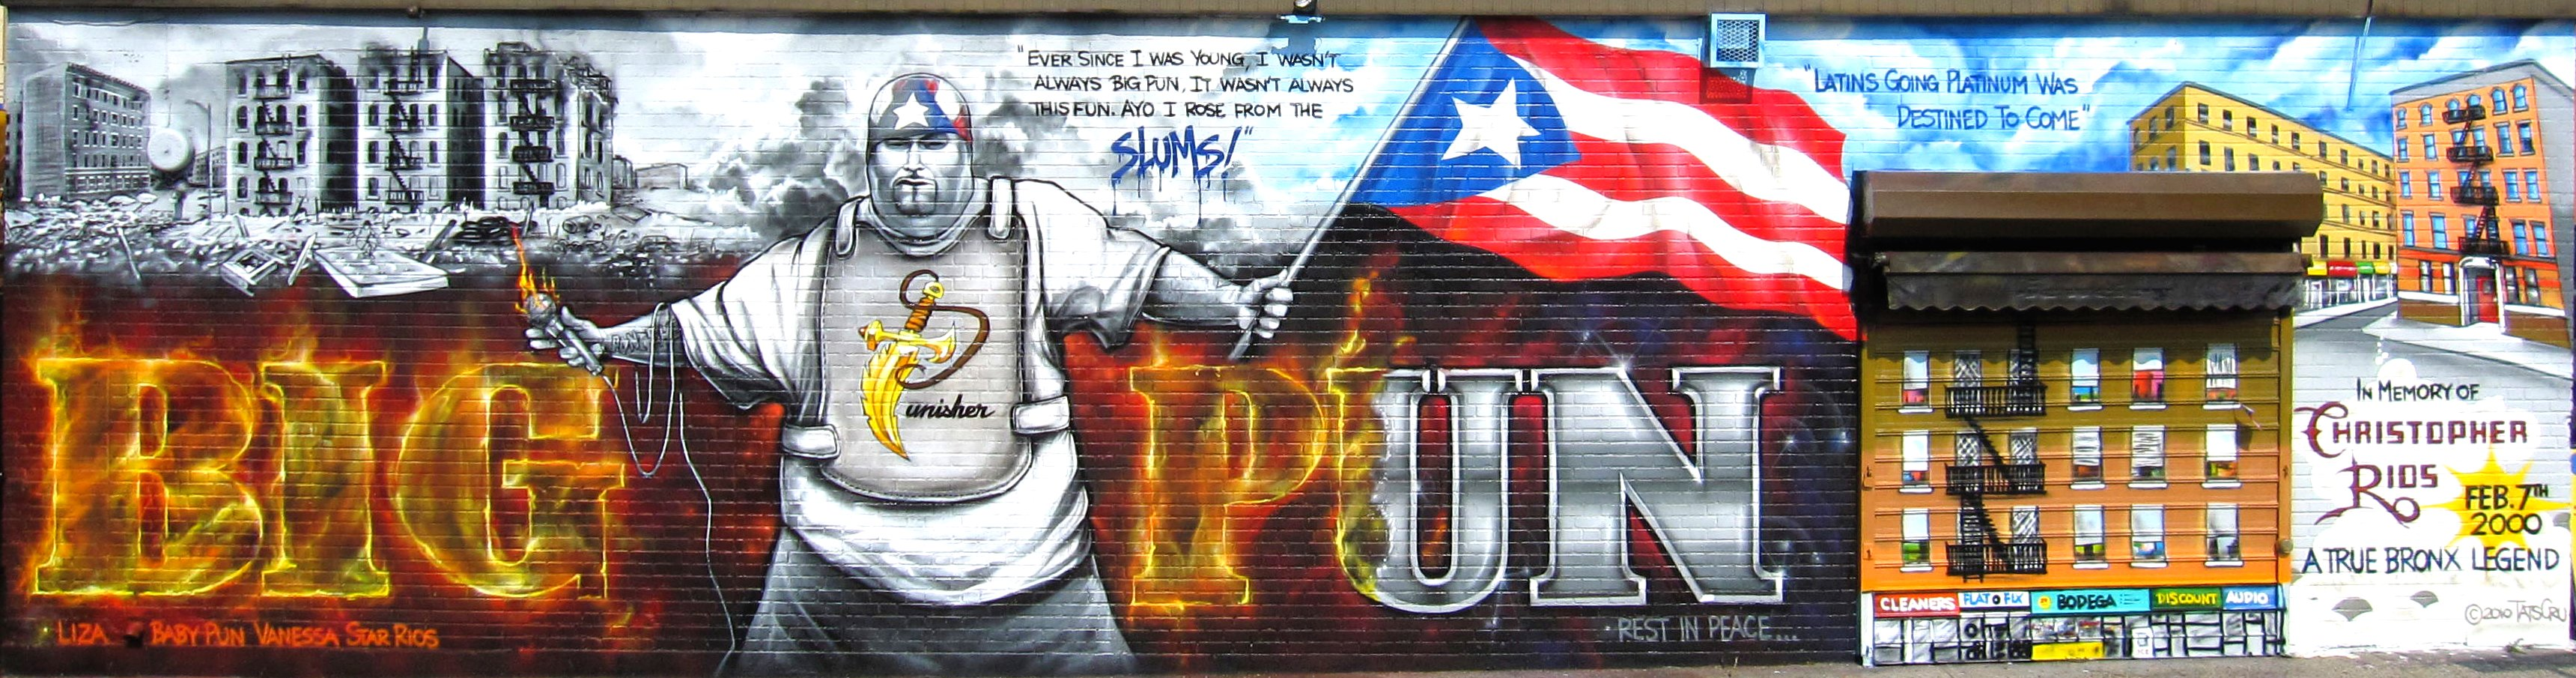 Big pun memorial wall flickr photo sharing for Big pun mural bronx